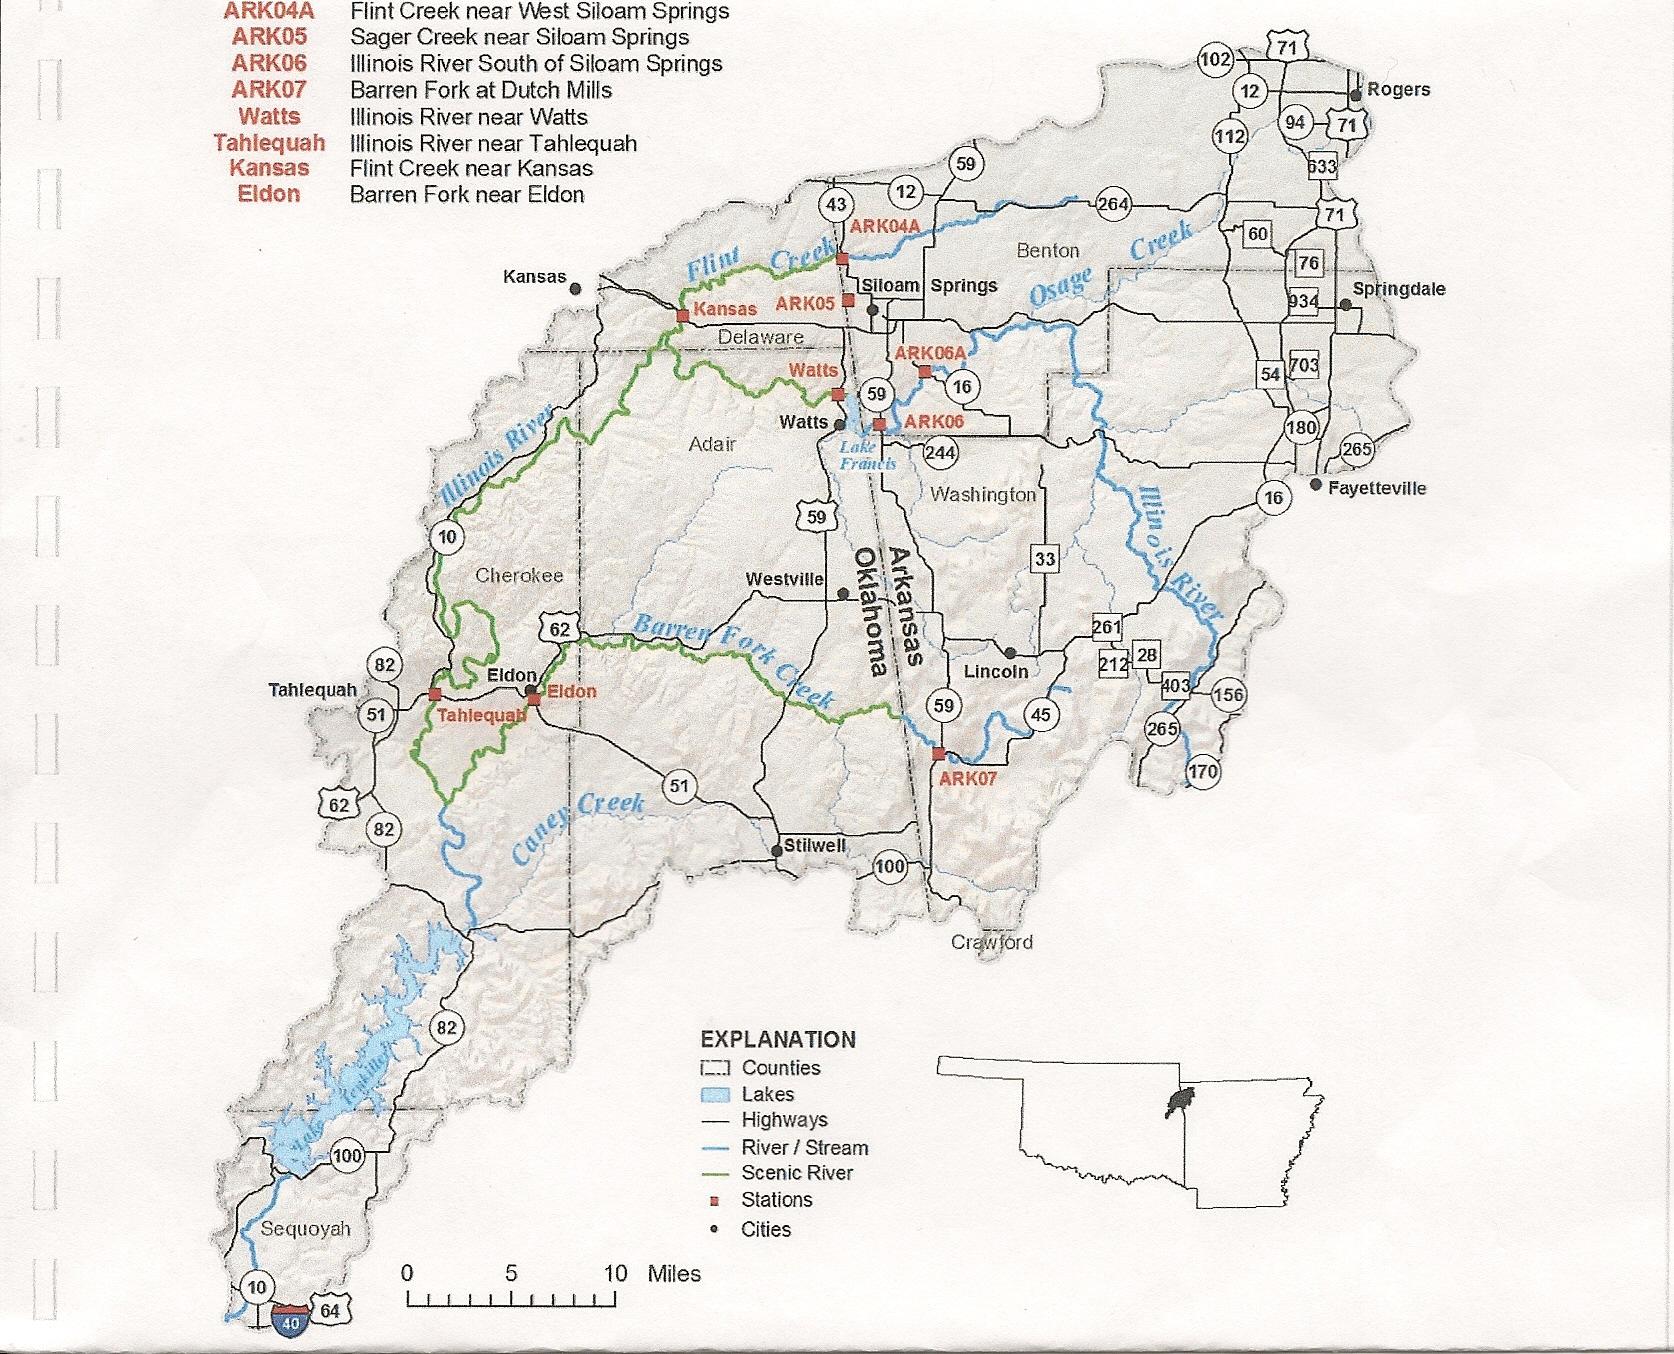 Report To The Arkansas Oklahoma Arkansas River Compact Commission Save The Illinois River Inc Oklahoma